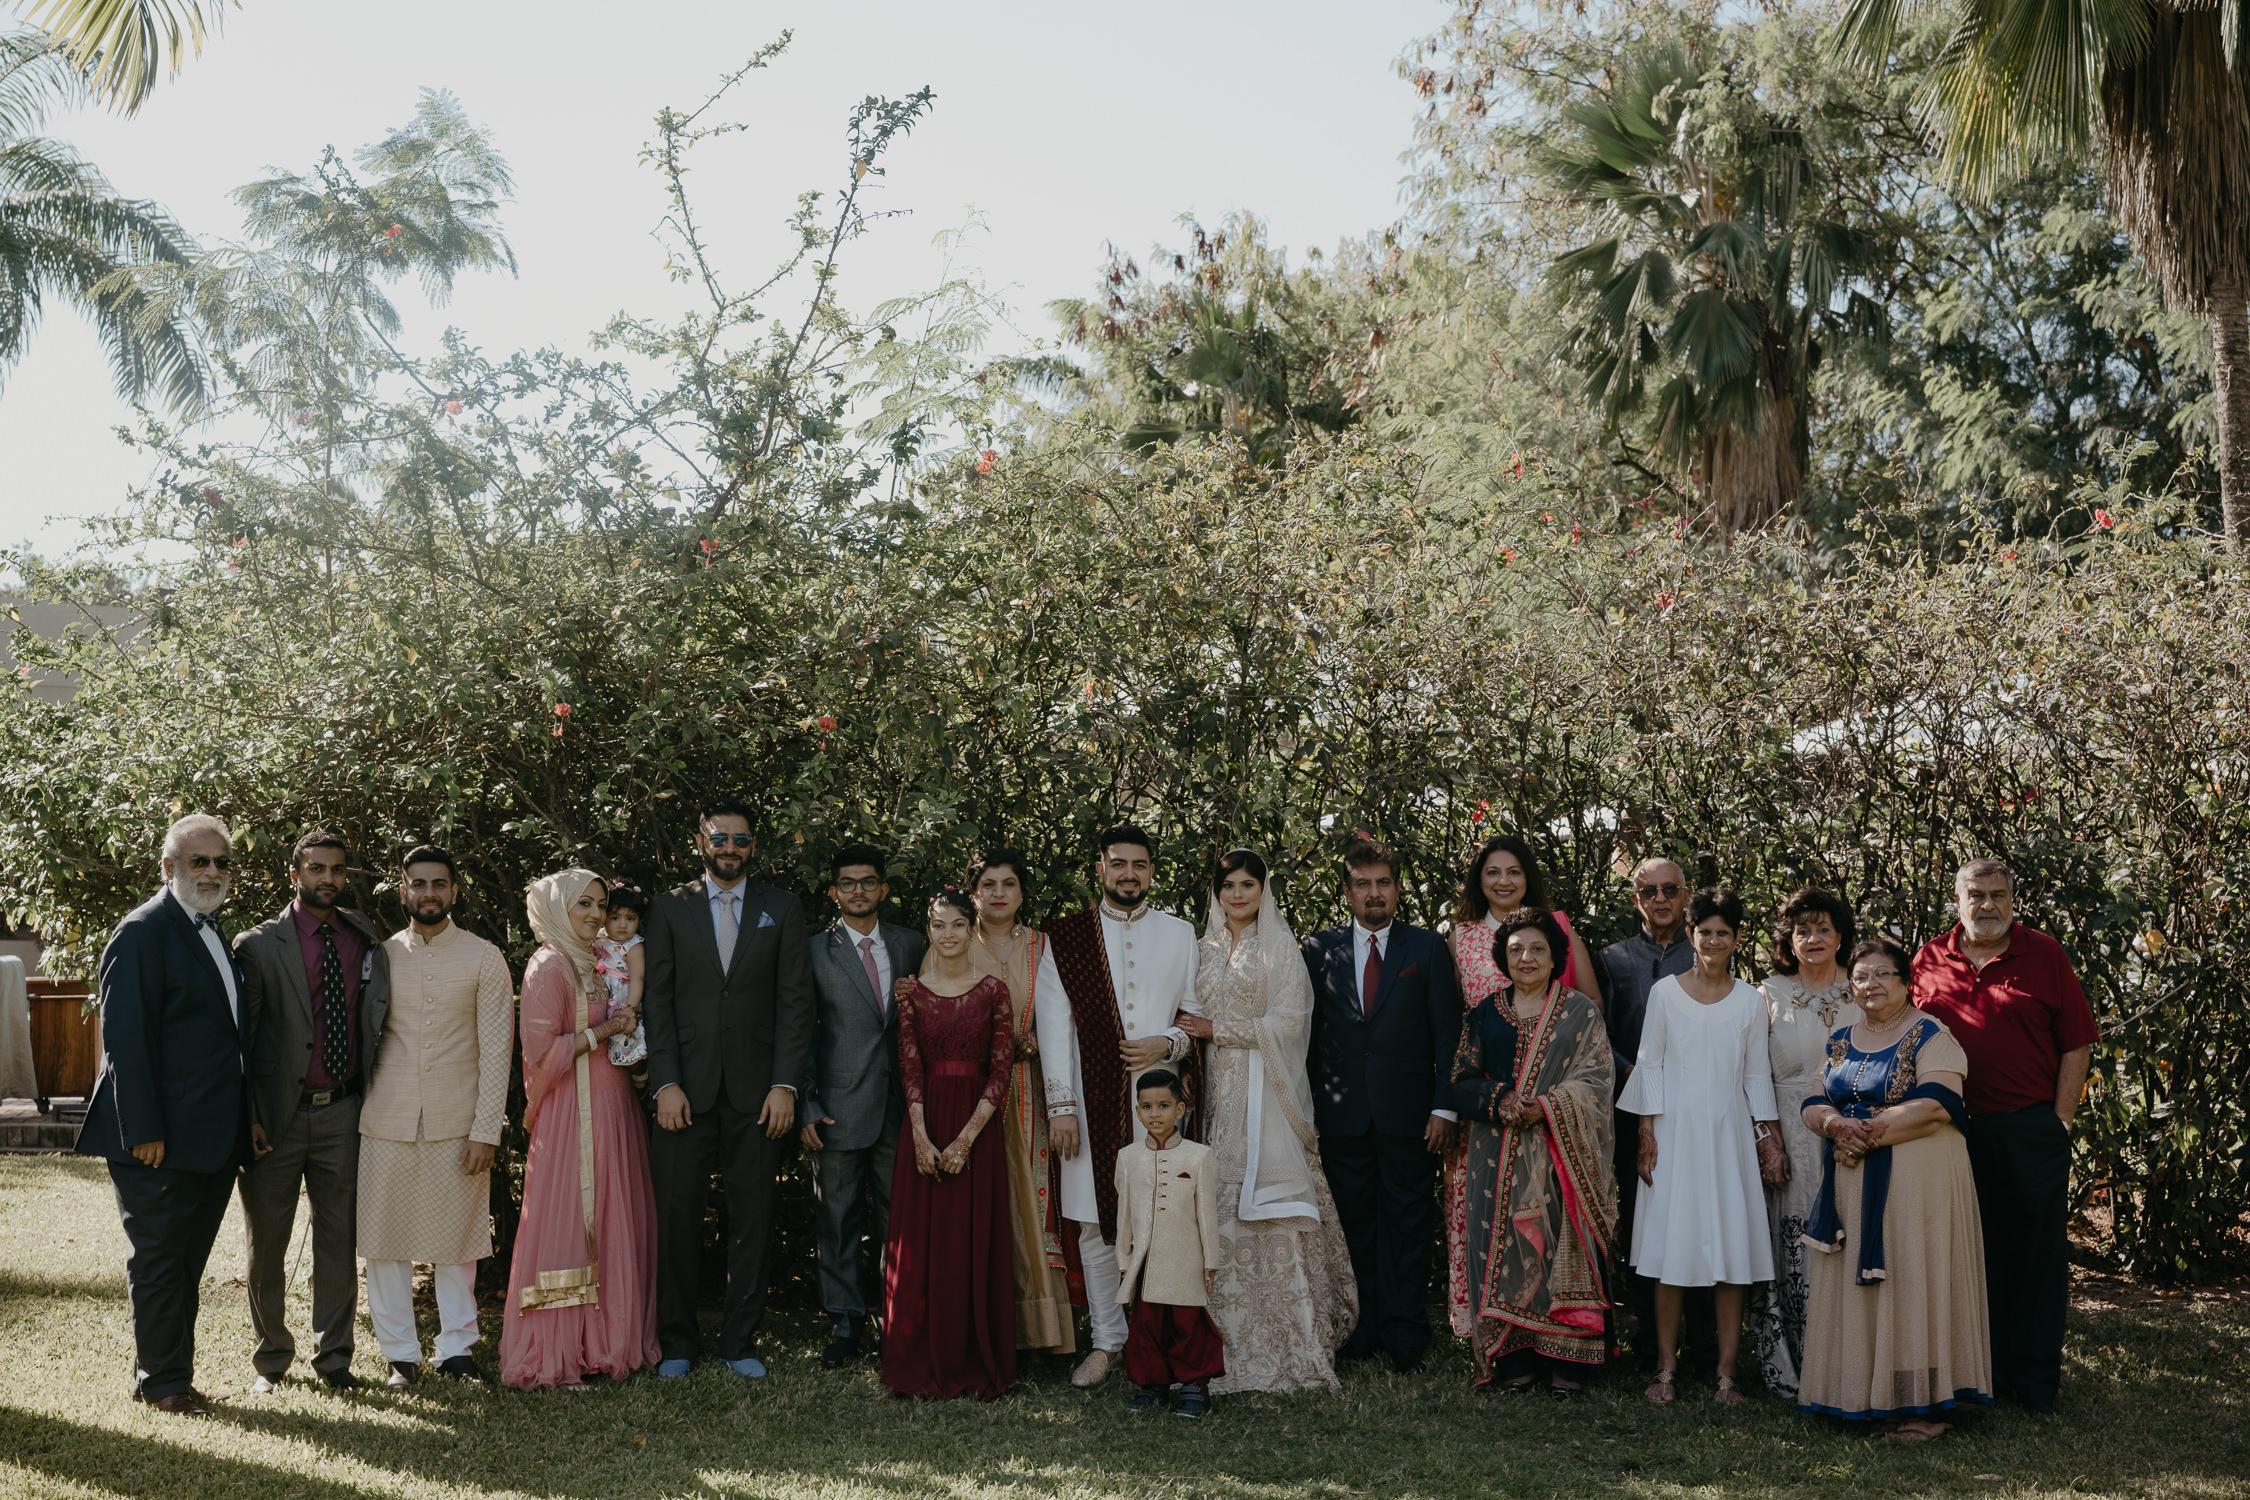 groepsfoto huwelijksfeest tanzania